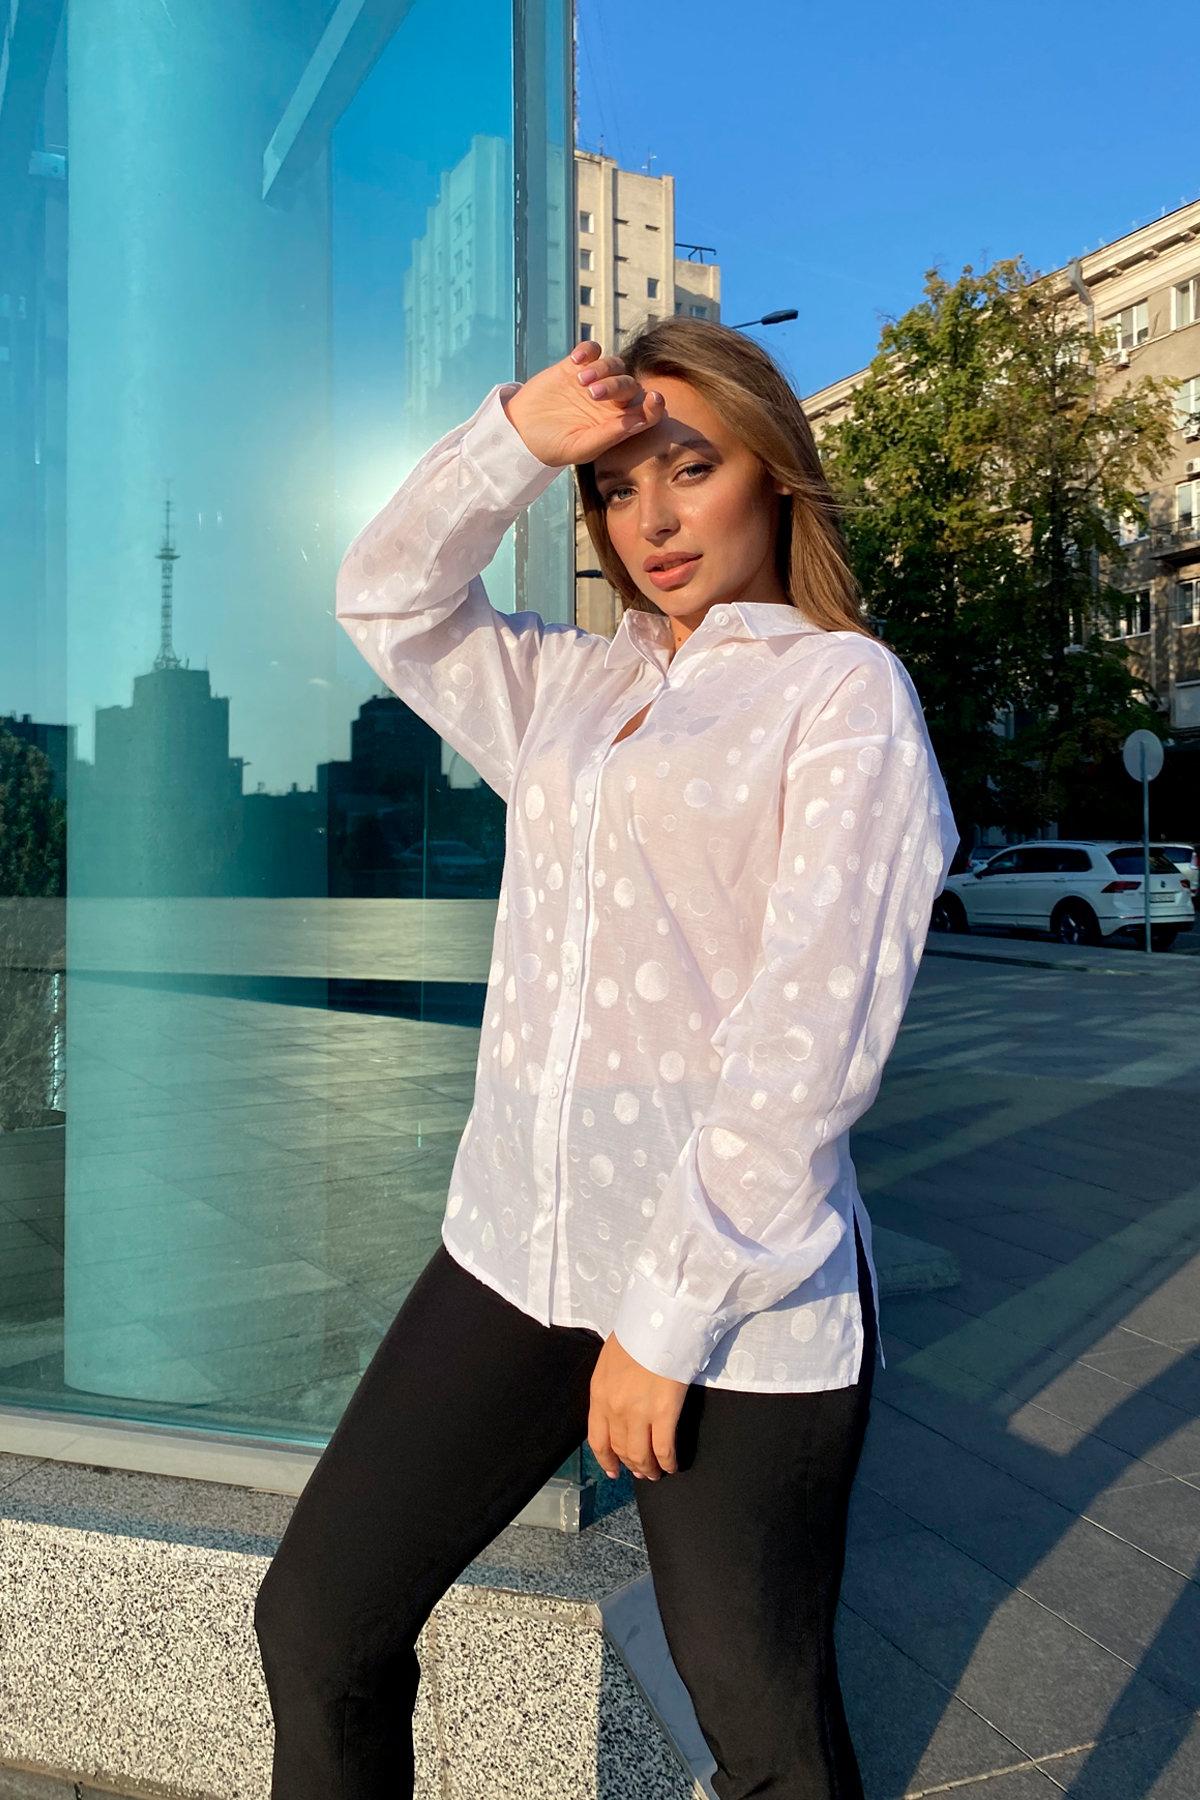 Блуза Эйплс 96242 АРТ. 45930 Цвет: Белый - фото 4, интернет магазин tm-modus.ru